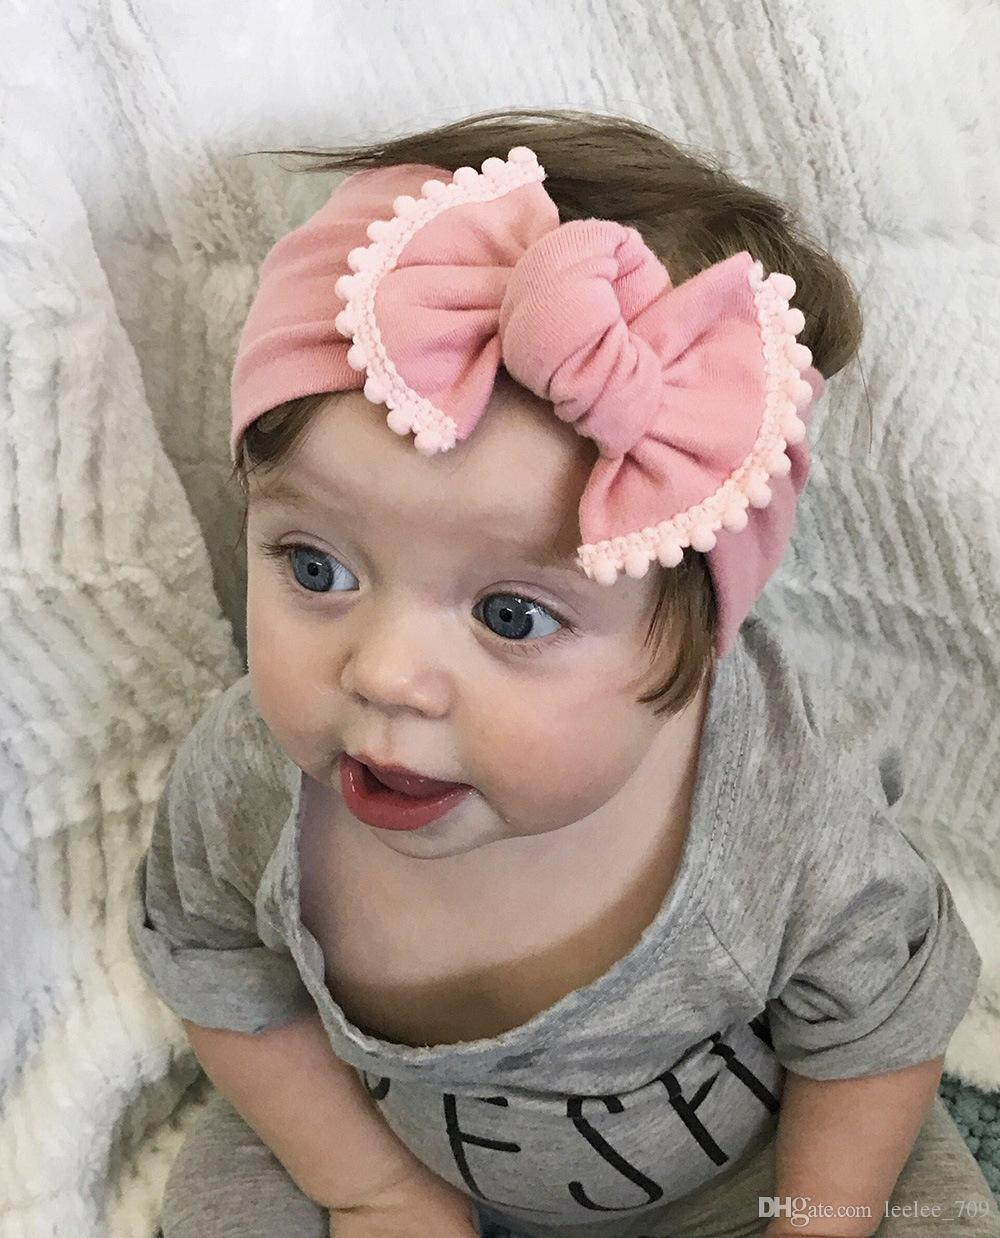 Moda bowknot bebé Bow Headband bebê Aaccessories para Crianças arco de cabelo Tie Bandas Contraste Cores Elatic headwrap cocar